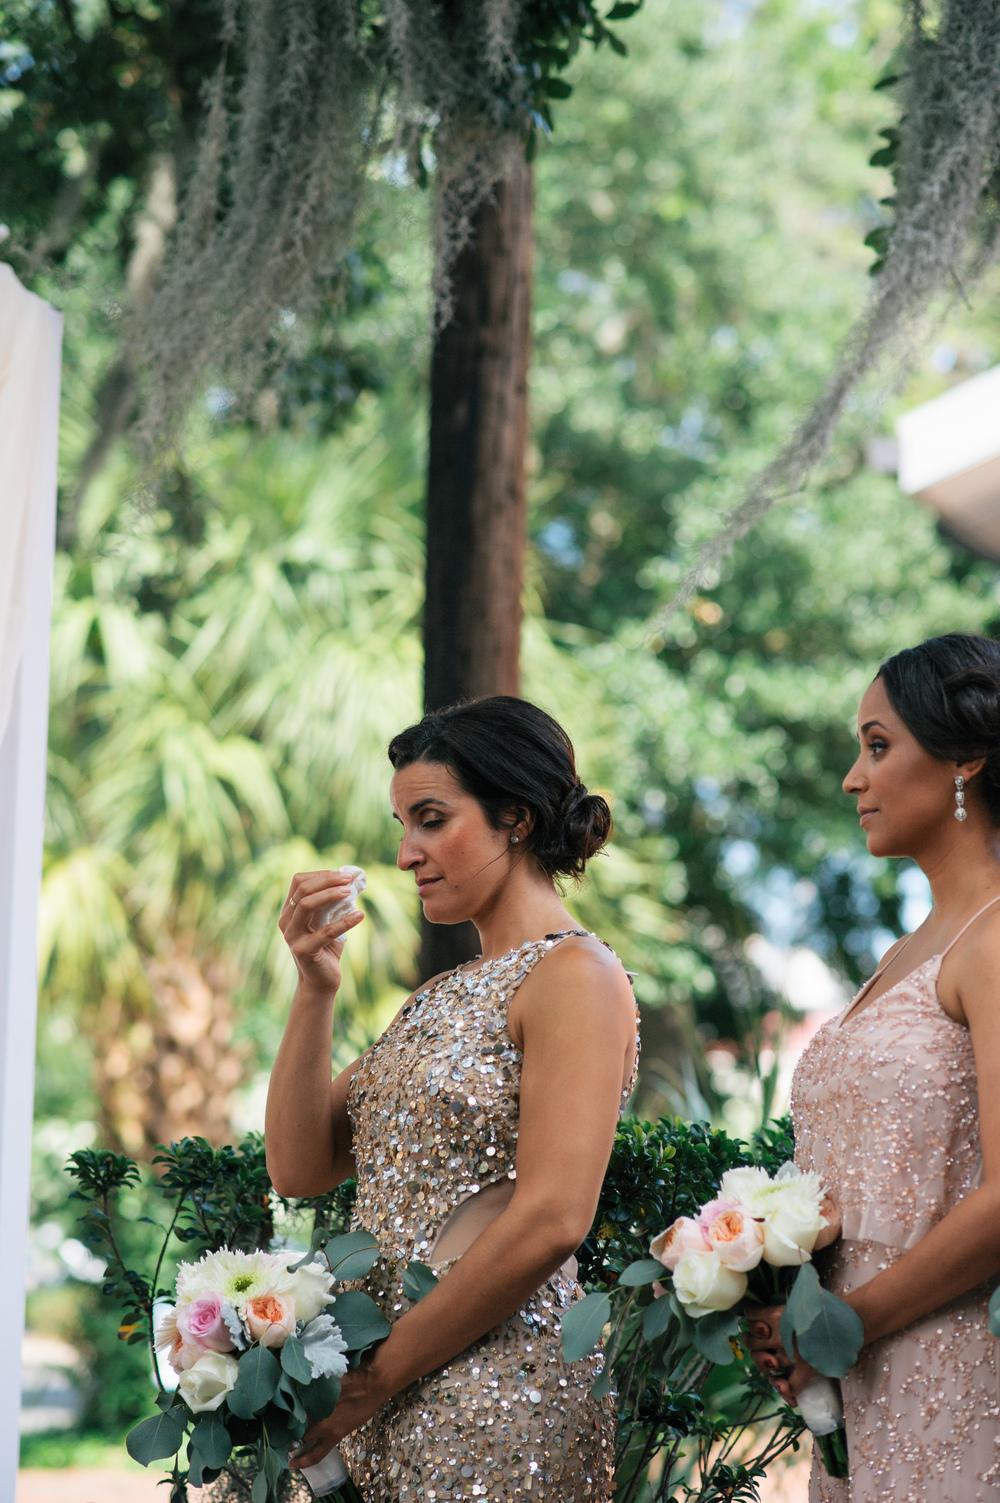 kacey-and-niall-June-4-savanna-georgia-wedding-m-newsom-photography- (307 of 961).jpg